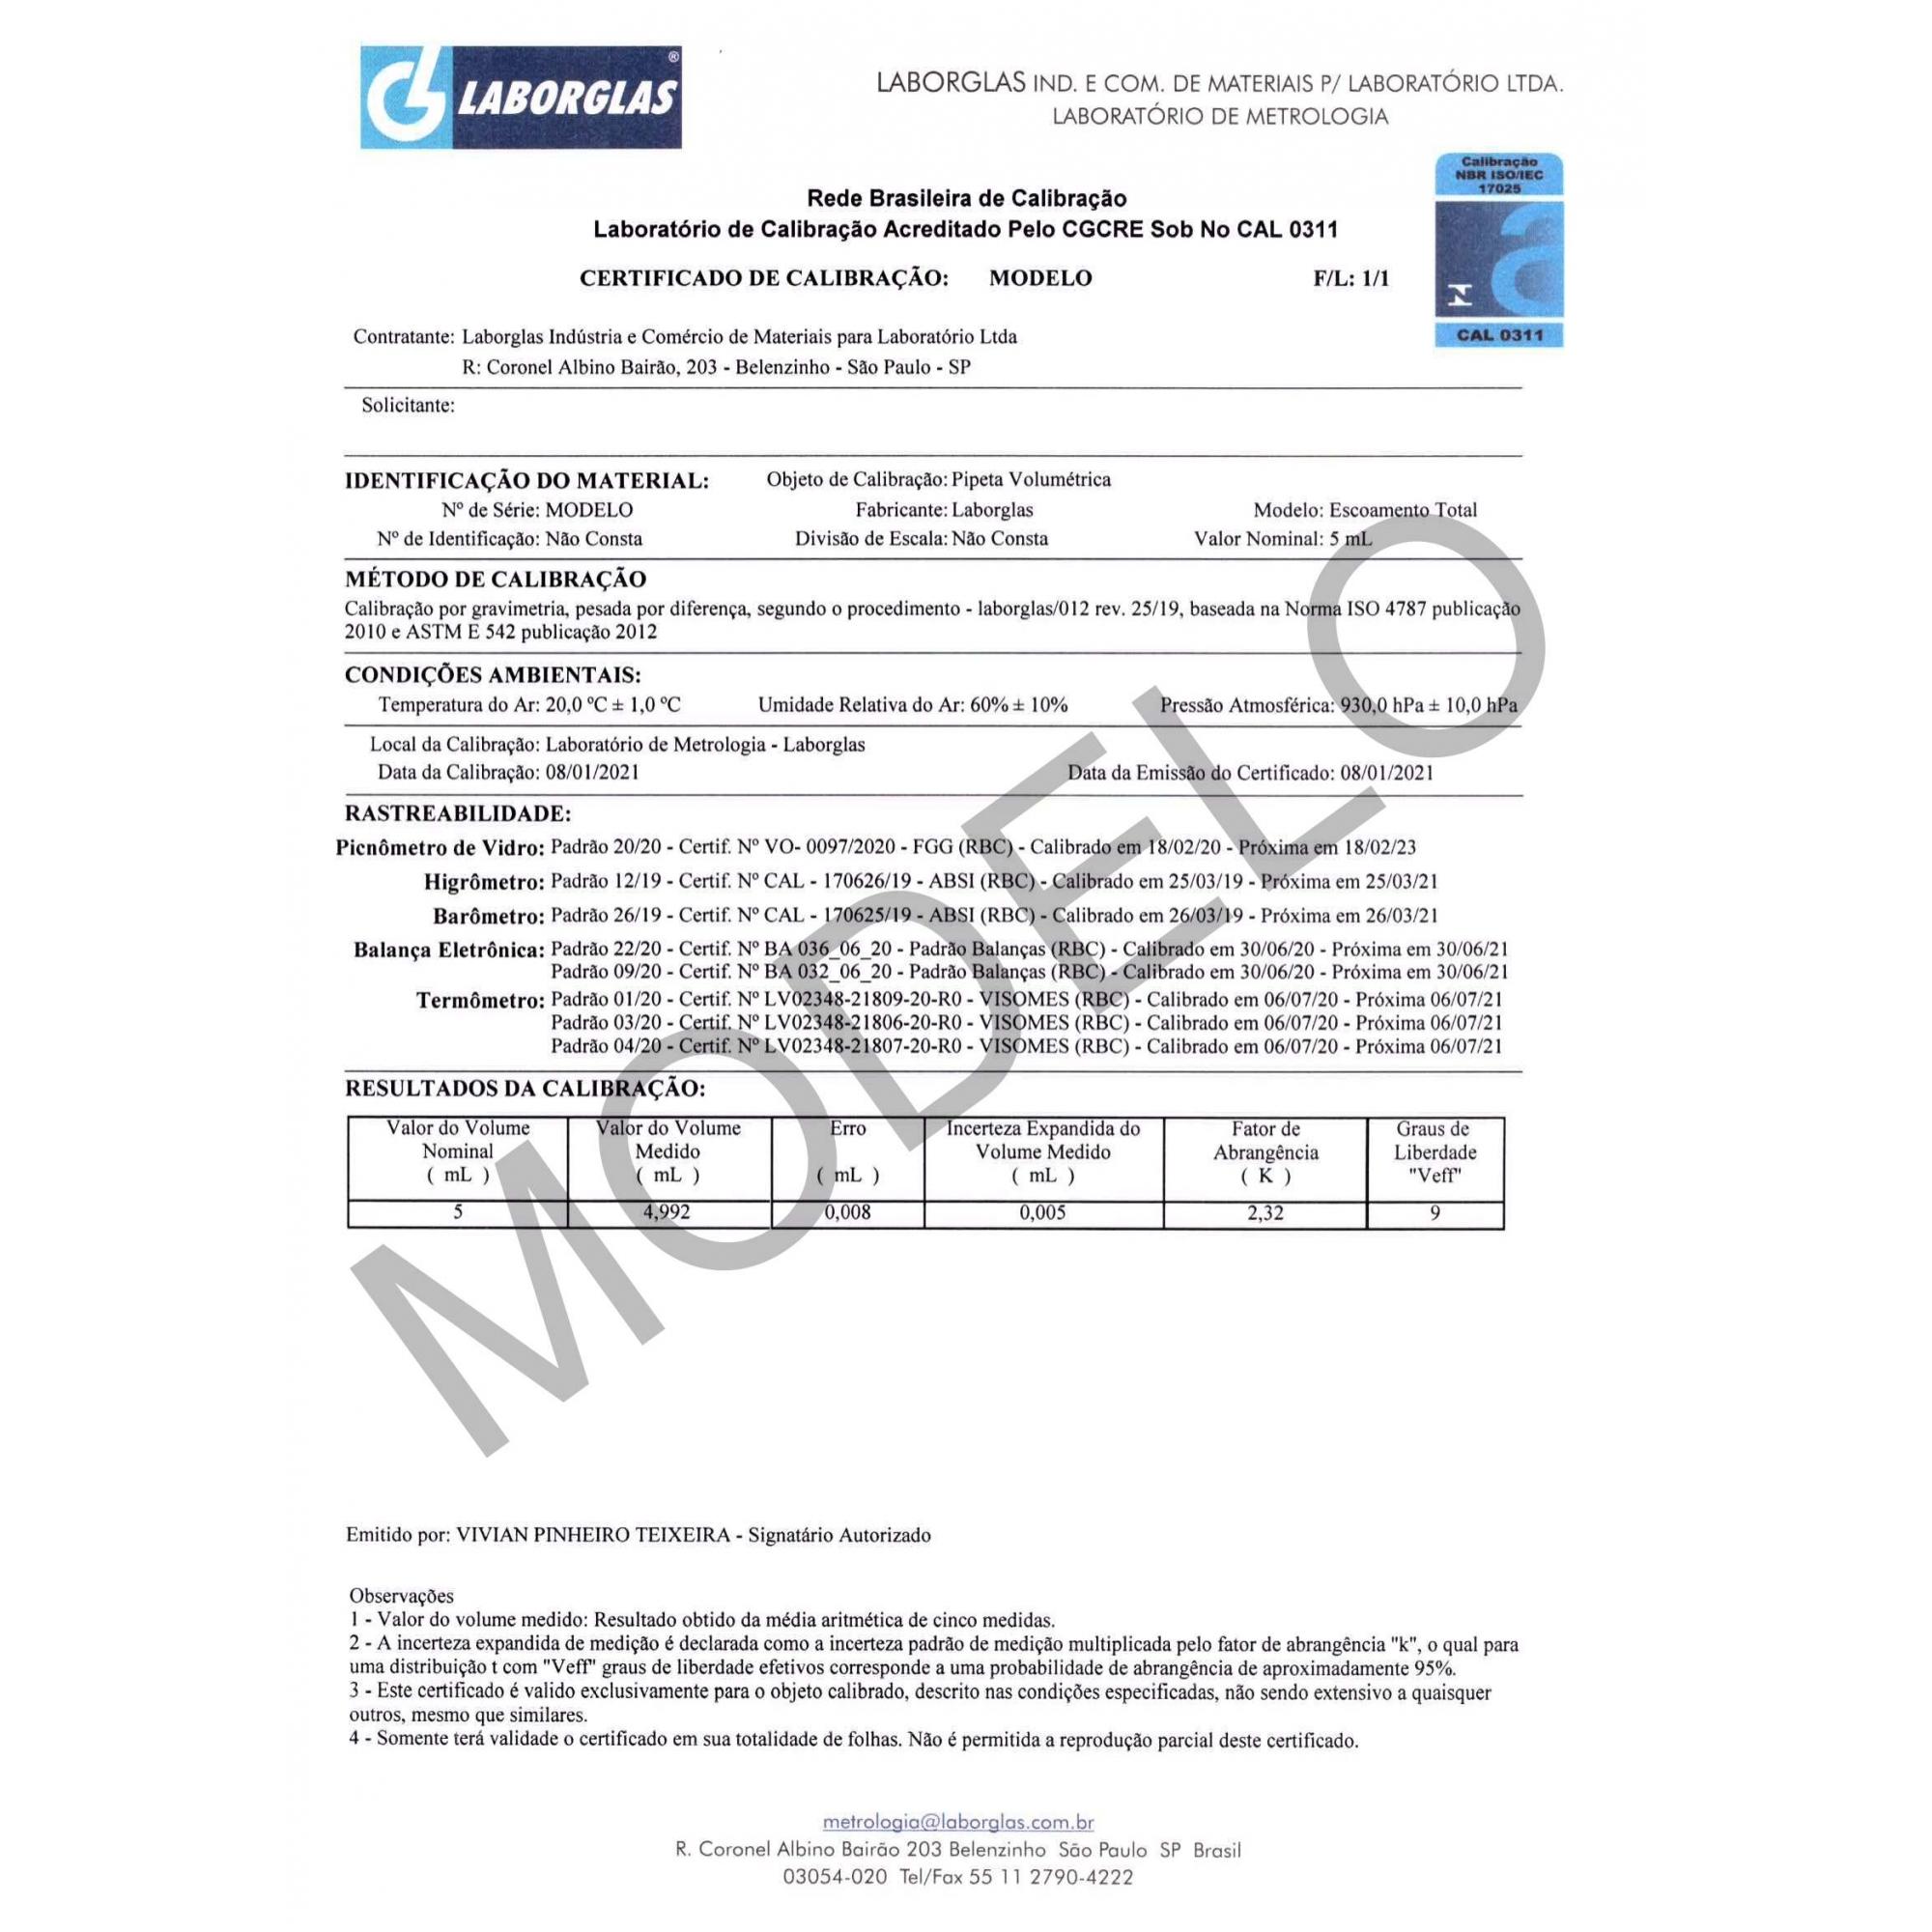 PIPETA VOLUMÉTRICA ESGOTAMENTO TOTAL 8 ML CERTIFICADO RBC - Laborglas - Cód. 9433709-R